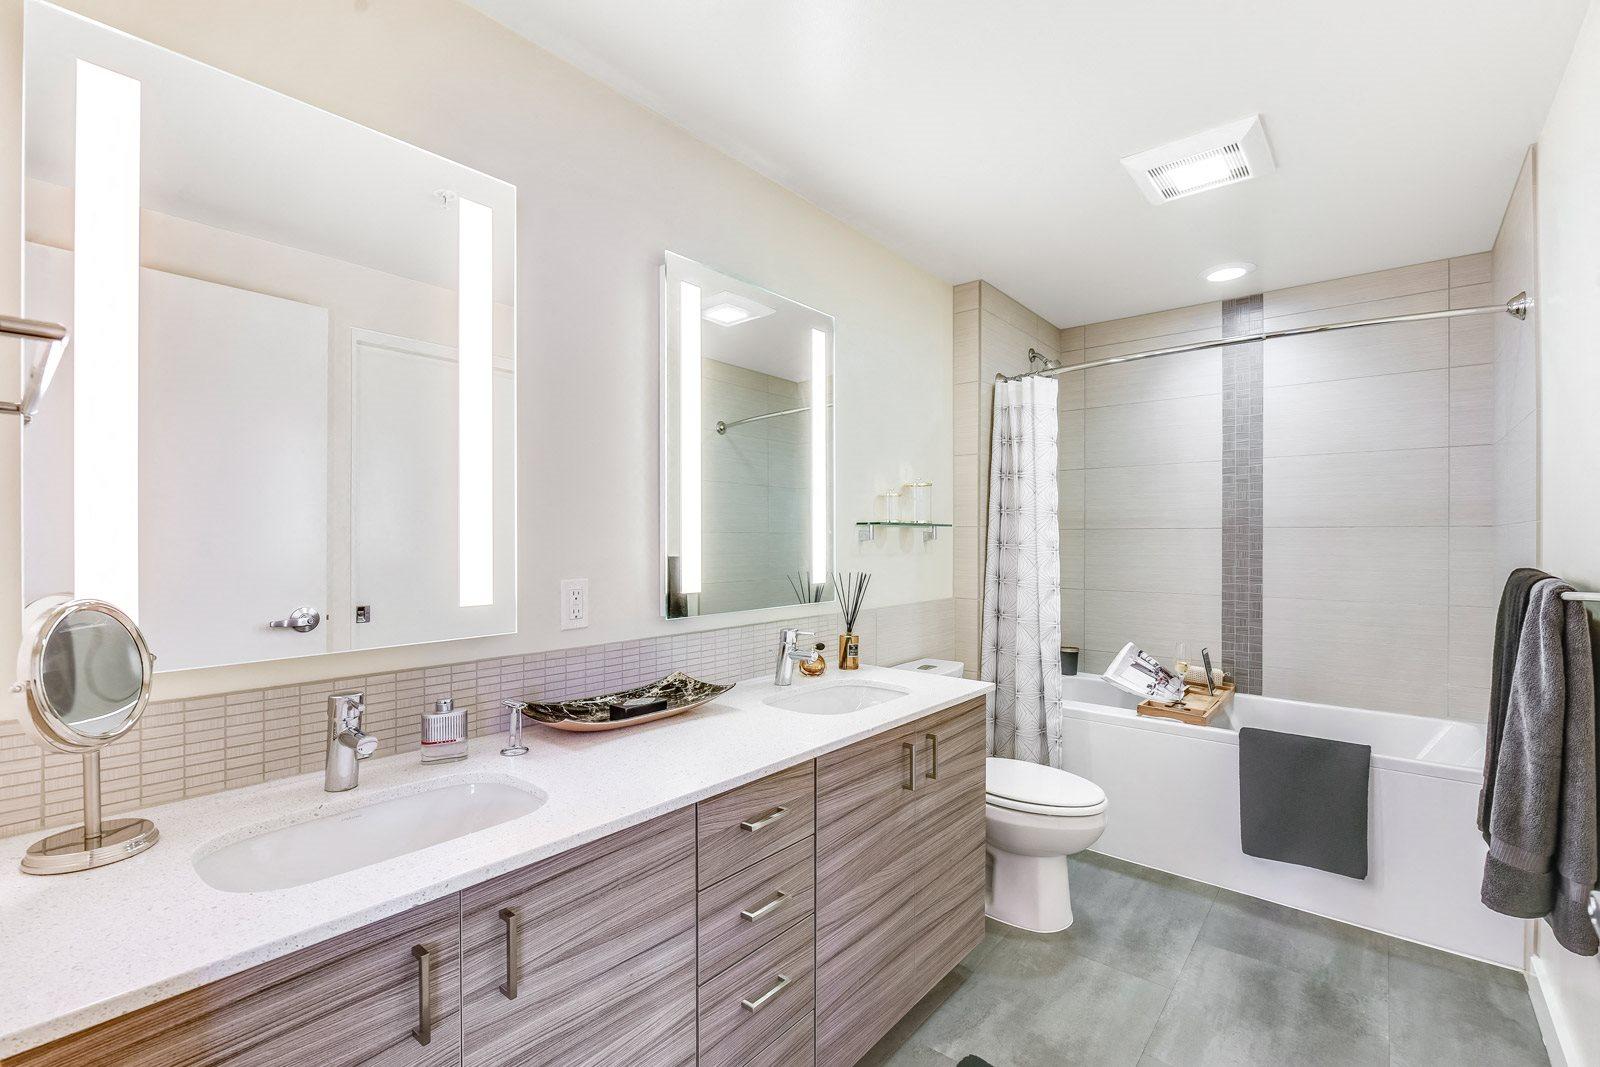 Designer Quartz Countertops and Tile Backsplashes at The Martin, Washington, 98121